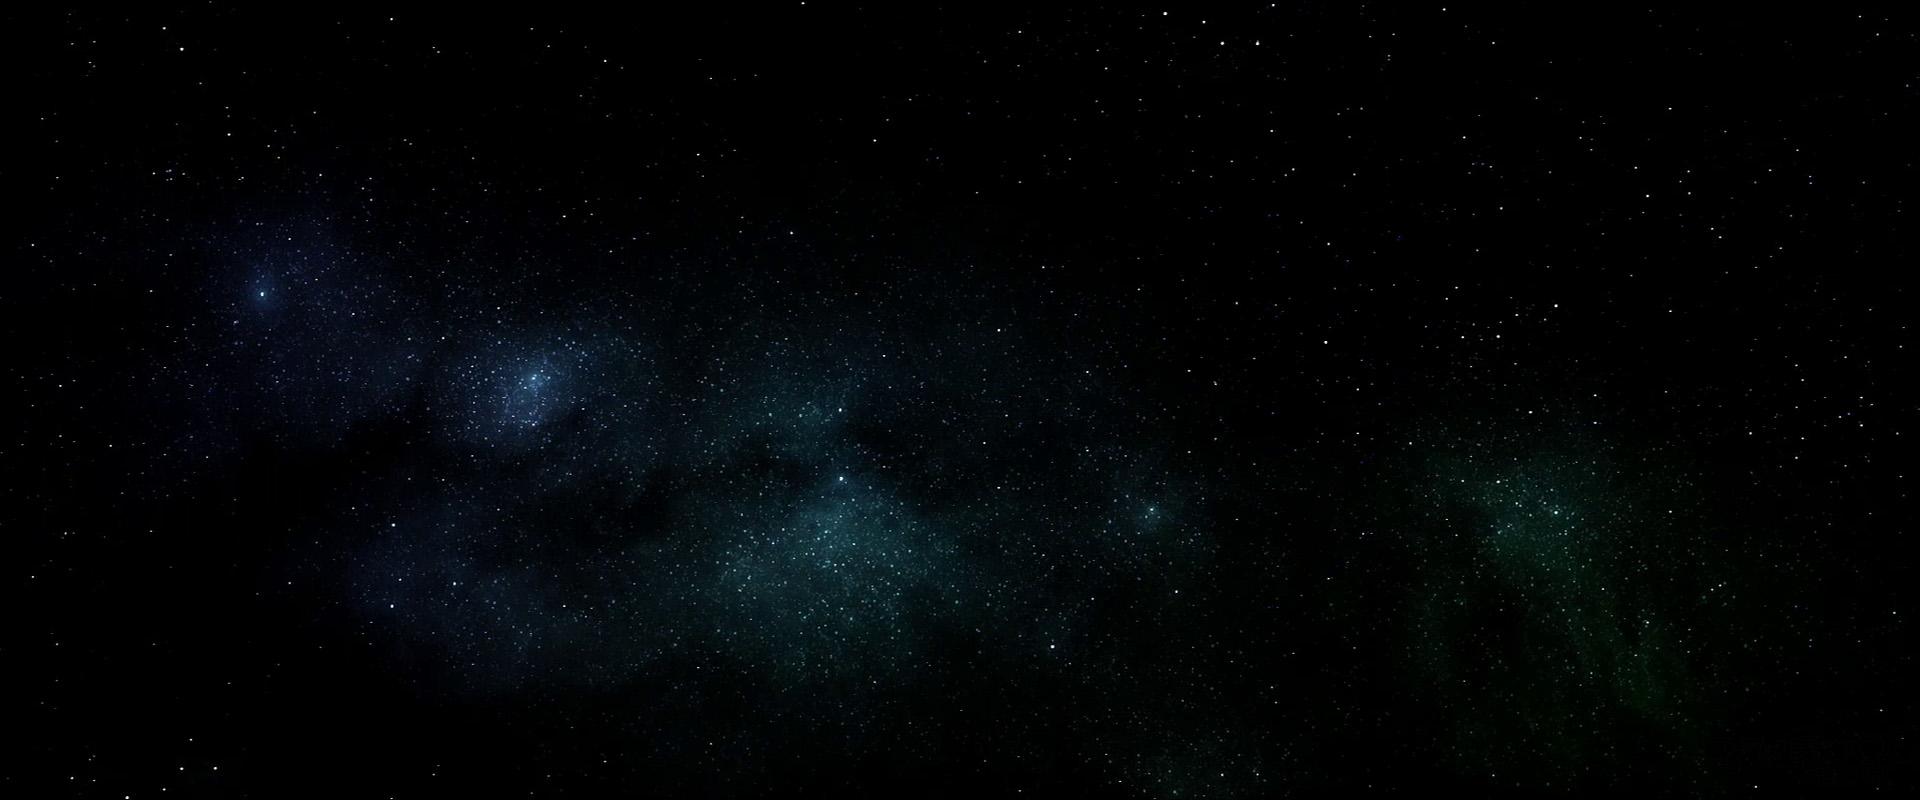 598803341_stars_122_490lo.jpg